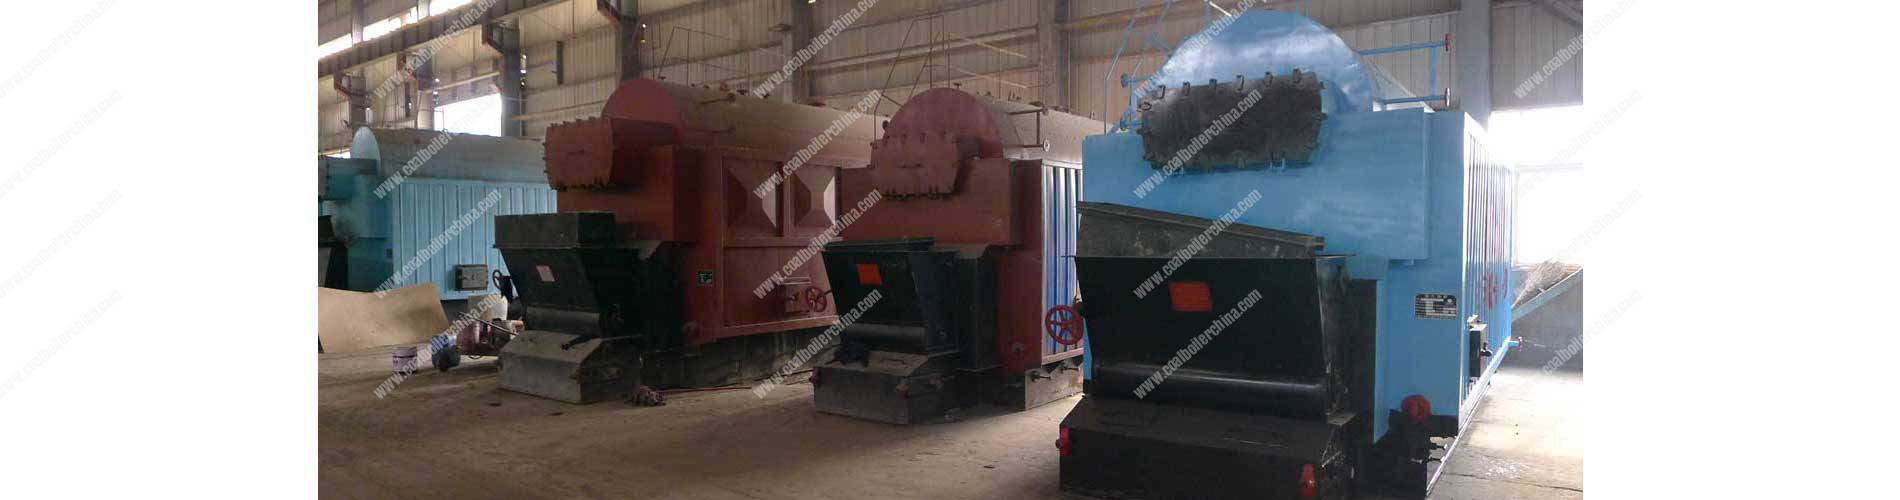 Chain Grate Coal Fired Steam Boilers